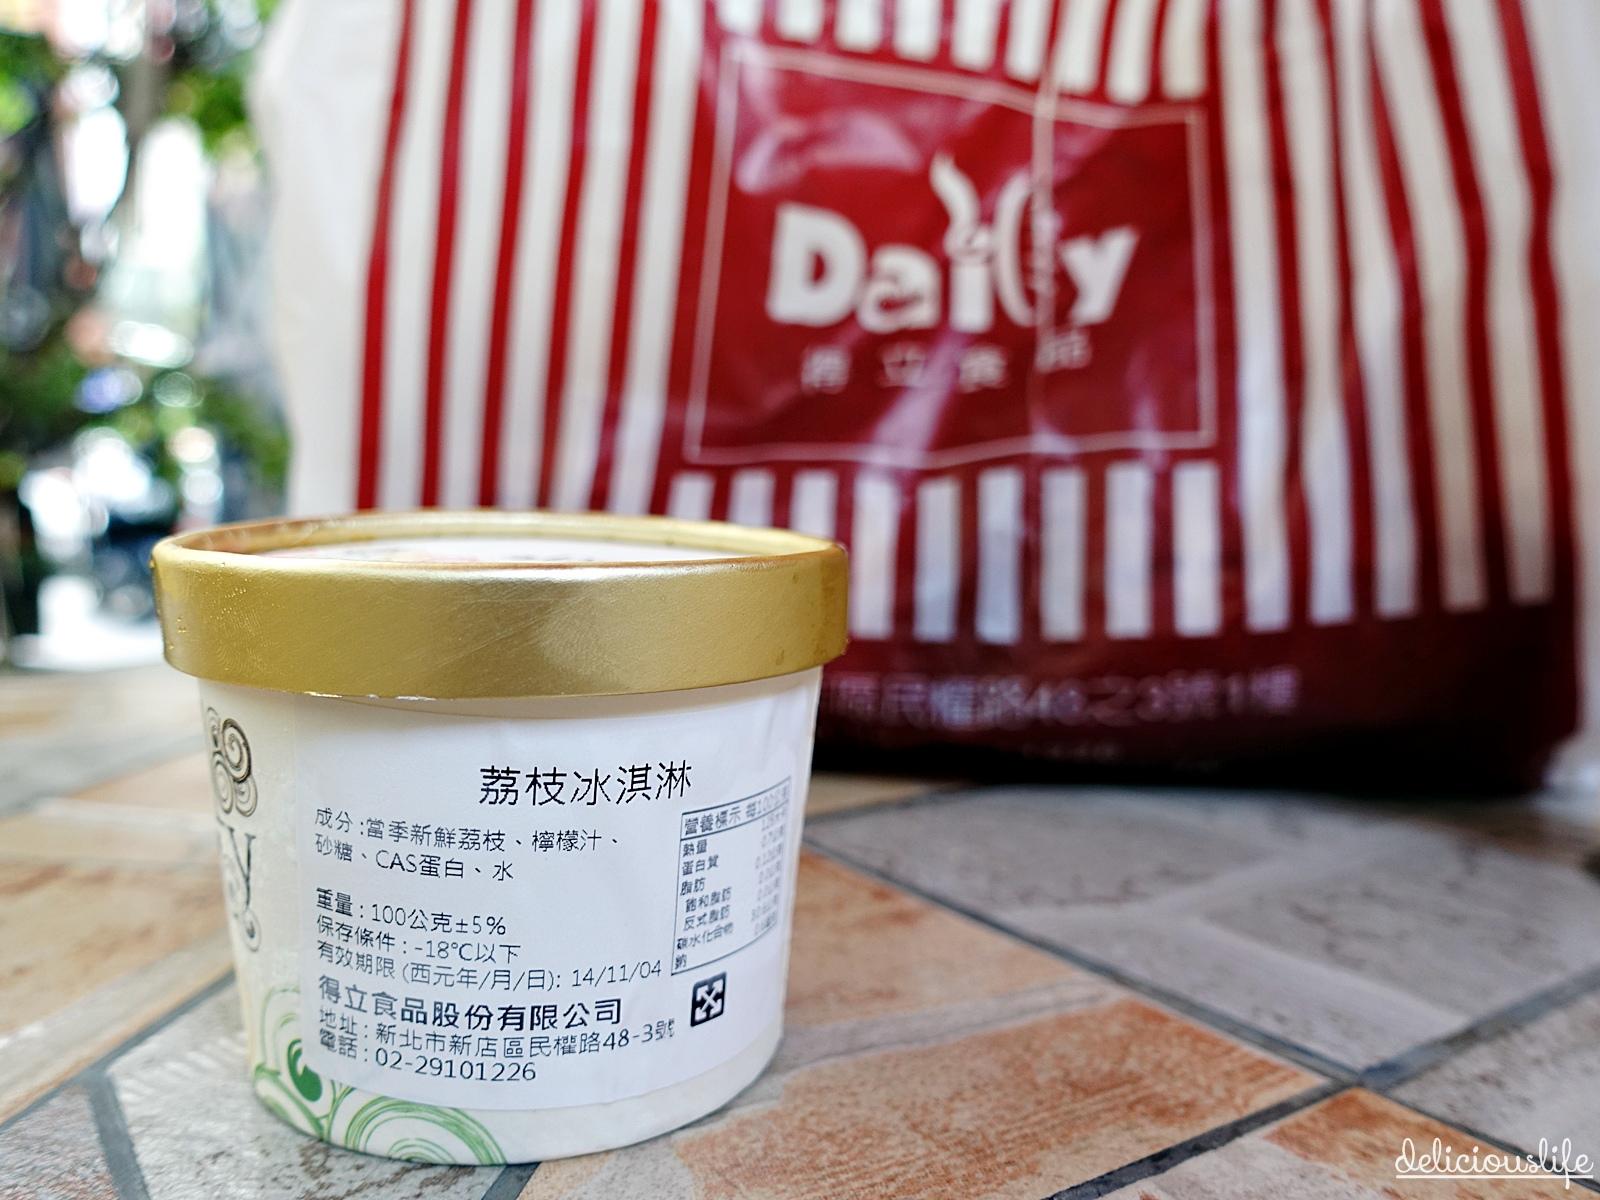 DailyBakery-4